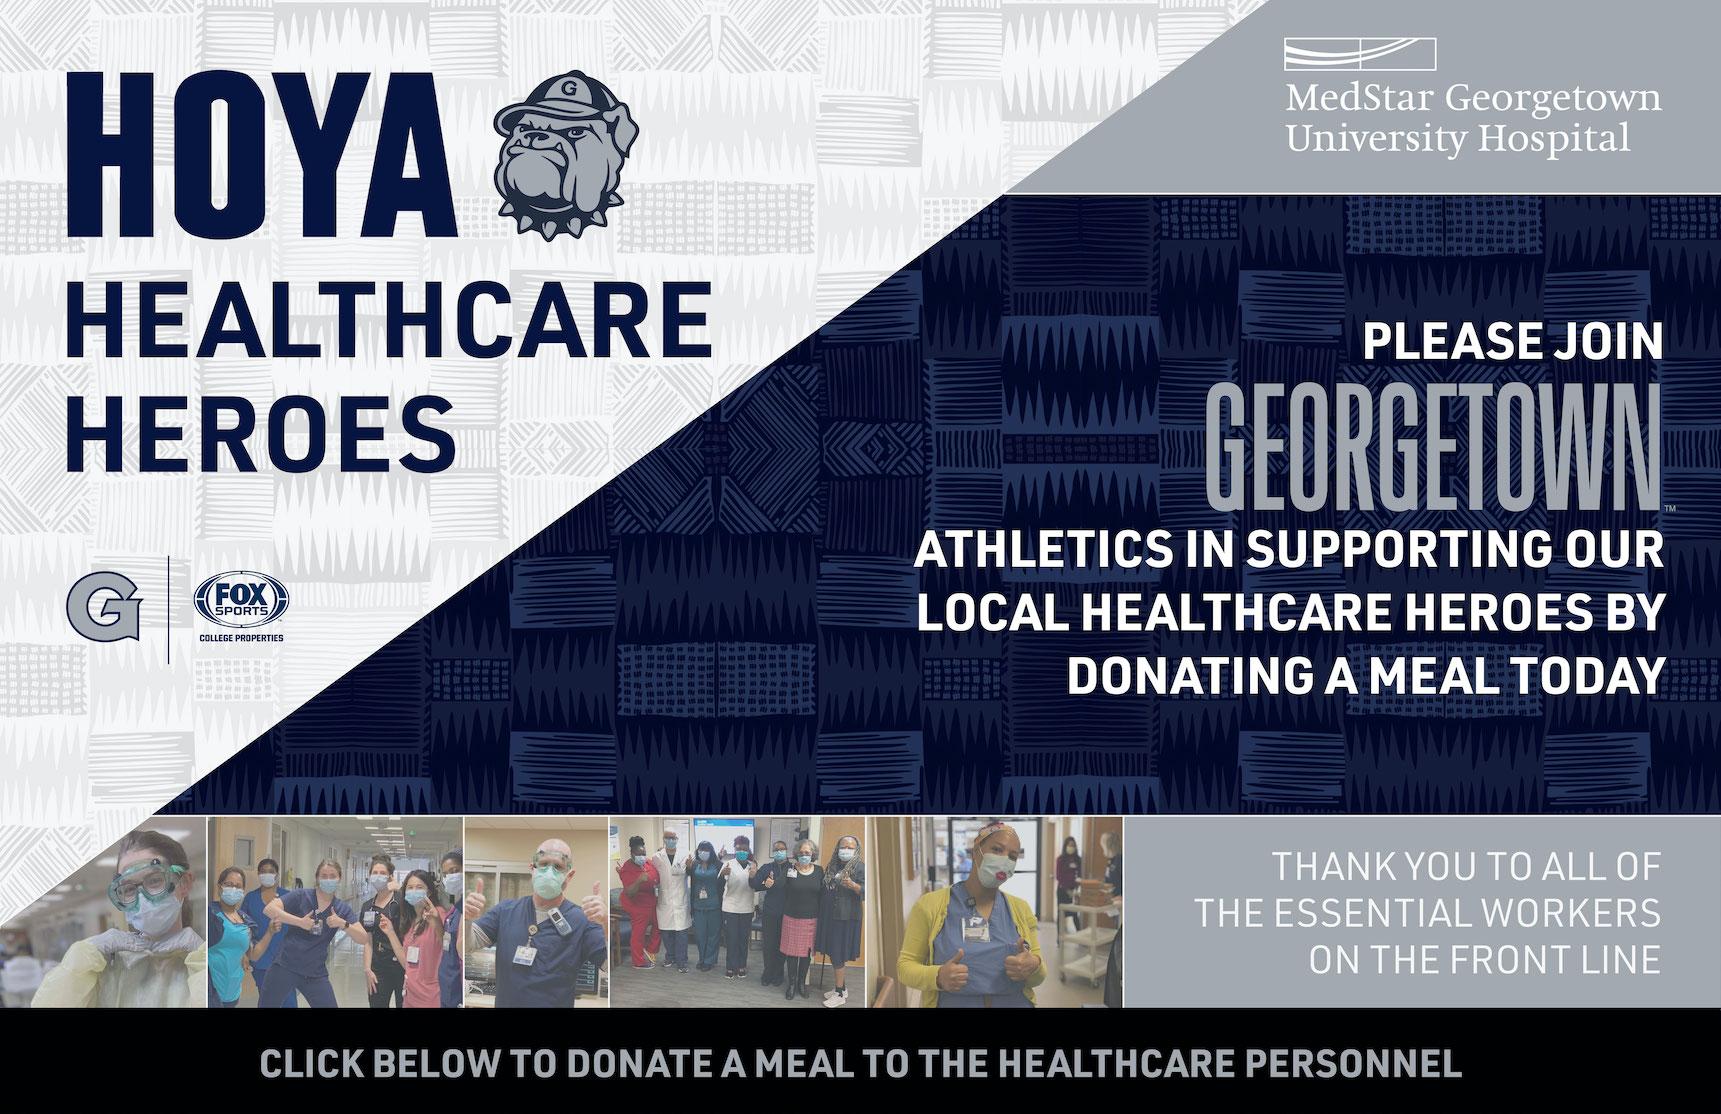 Hoya Healthcare Heroes